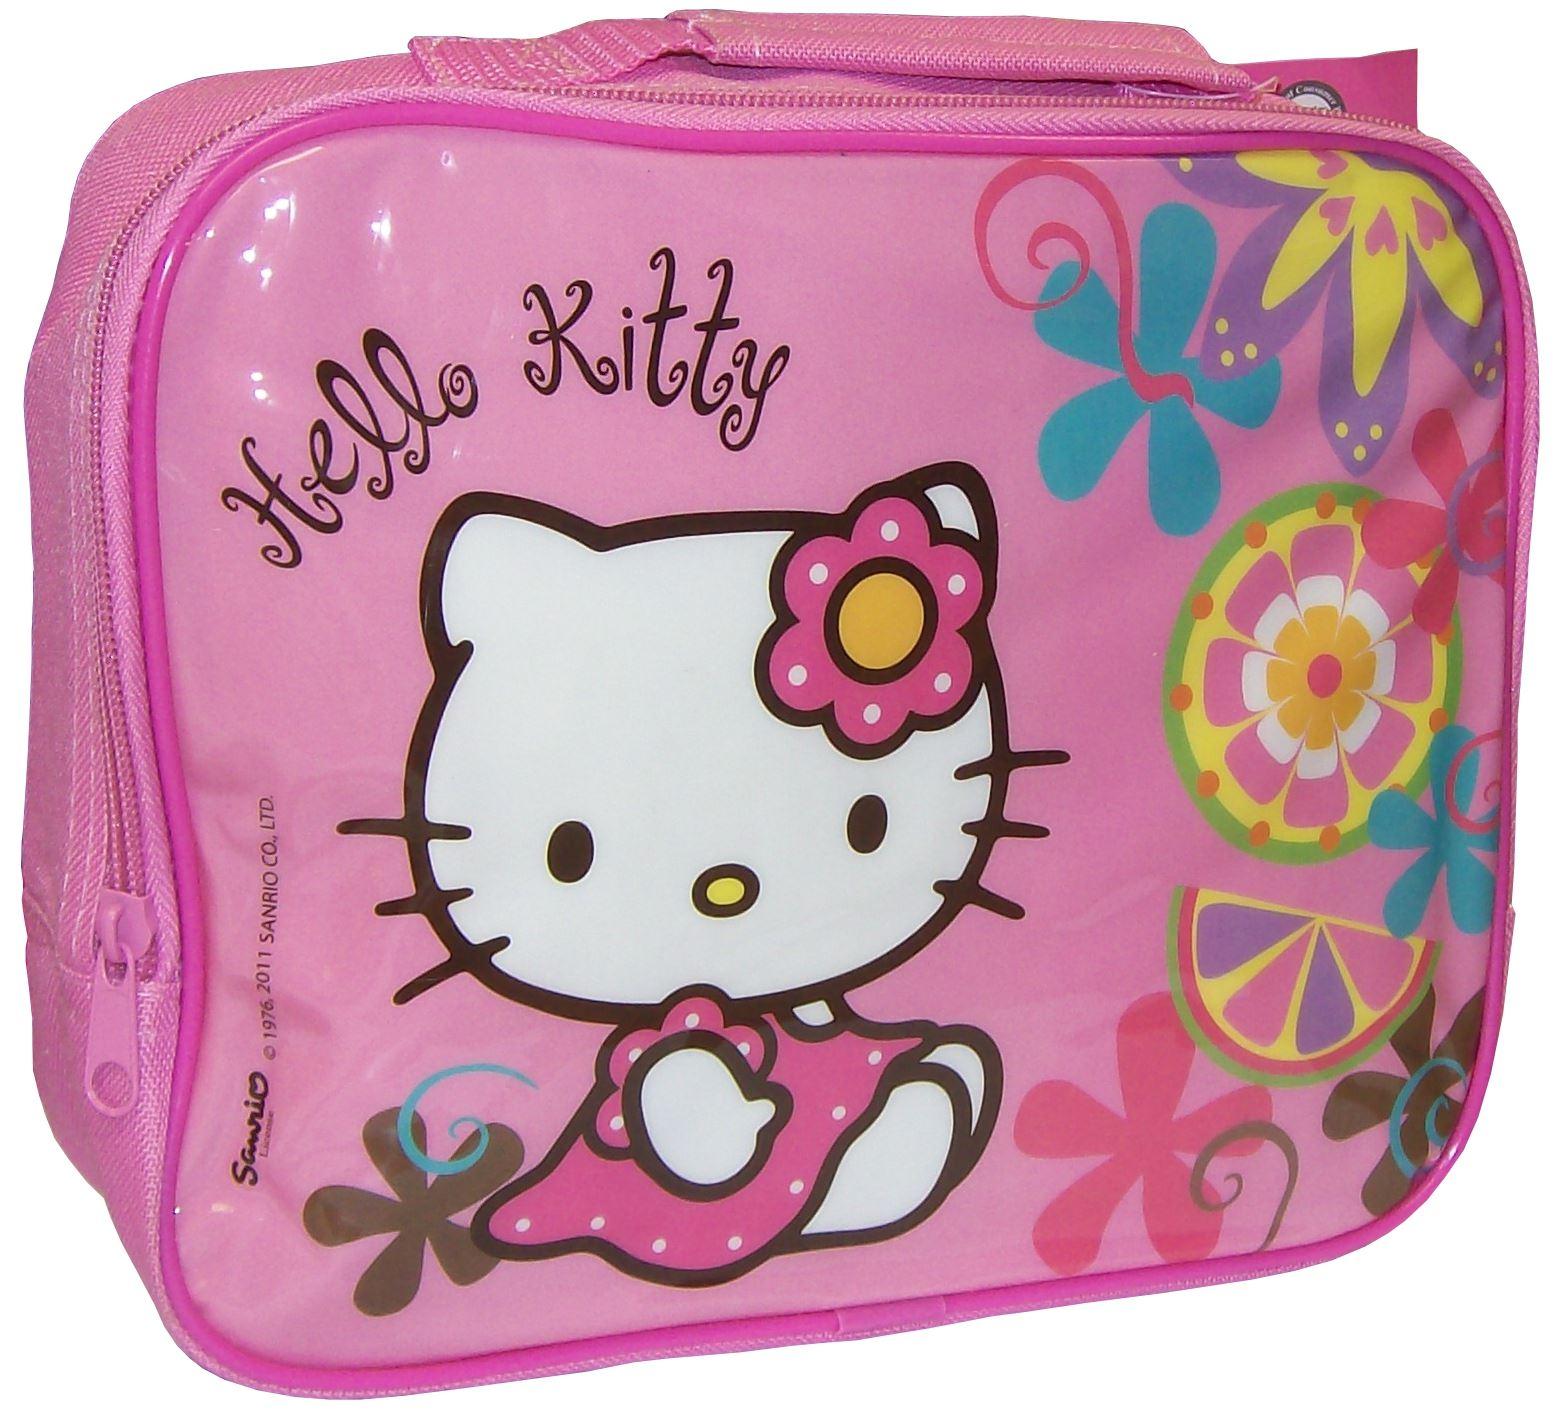 Магазин Хелло Китти Hello Kitty купить